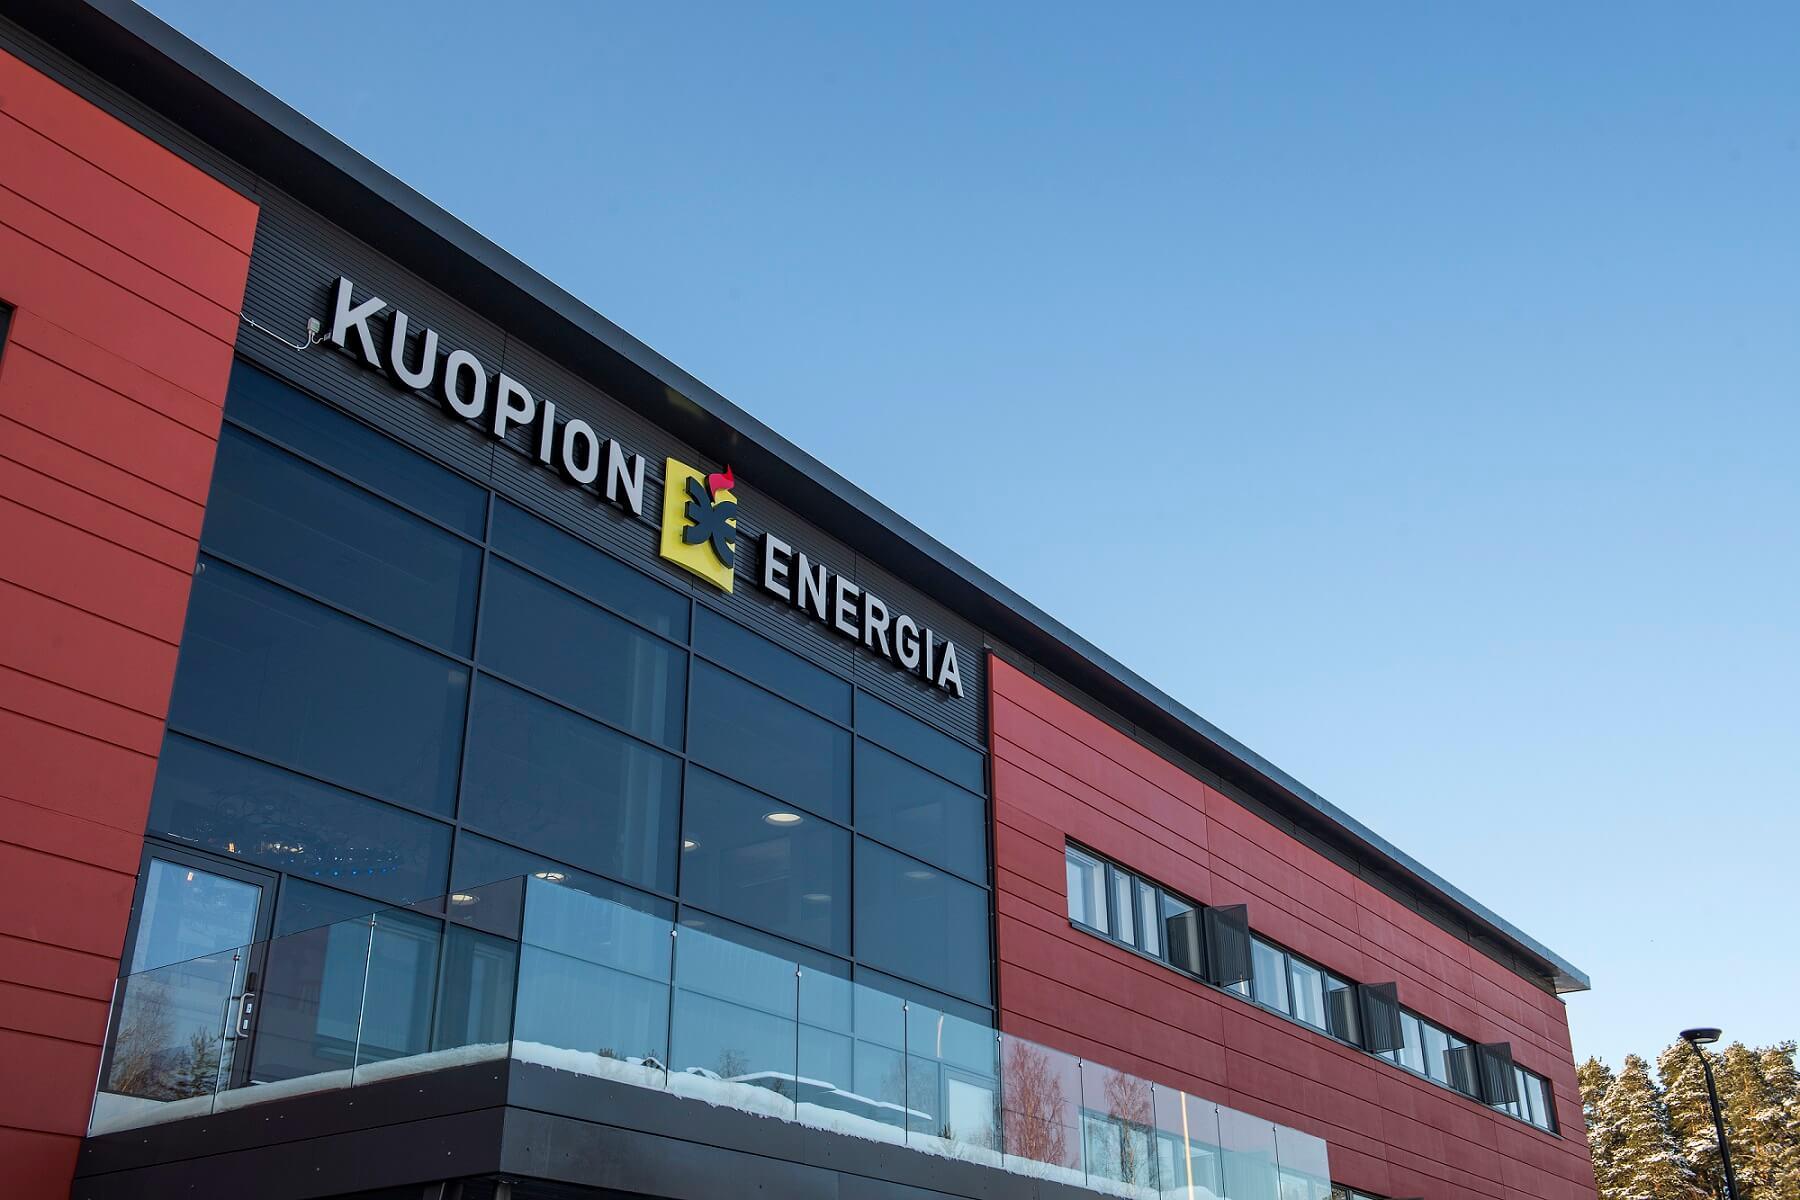 M2: Kuopion Energia